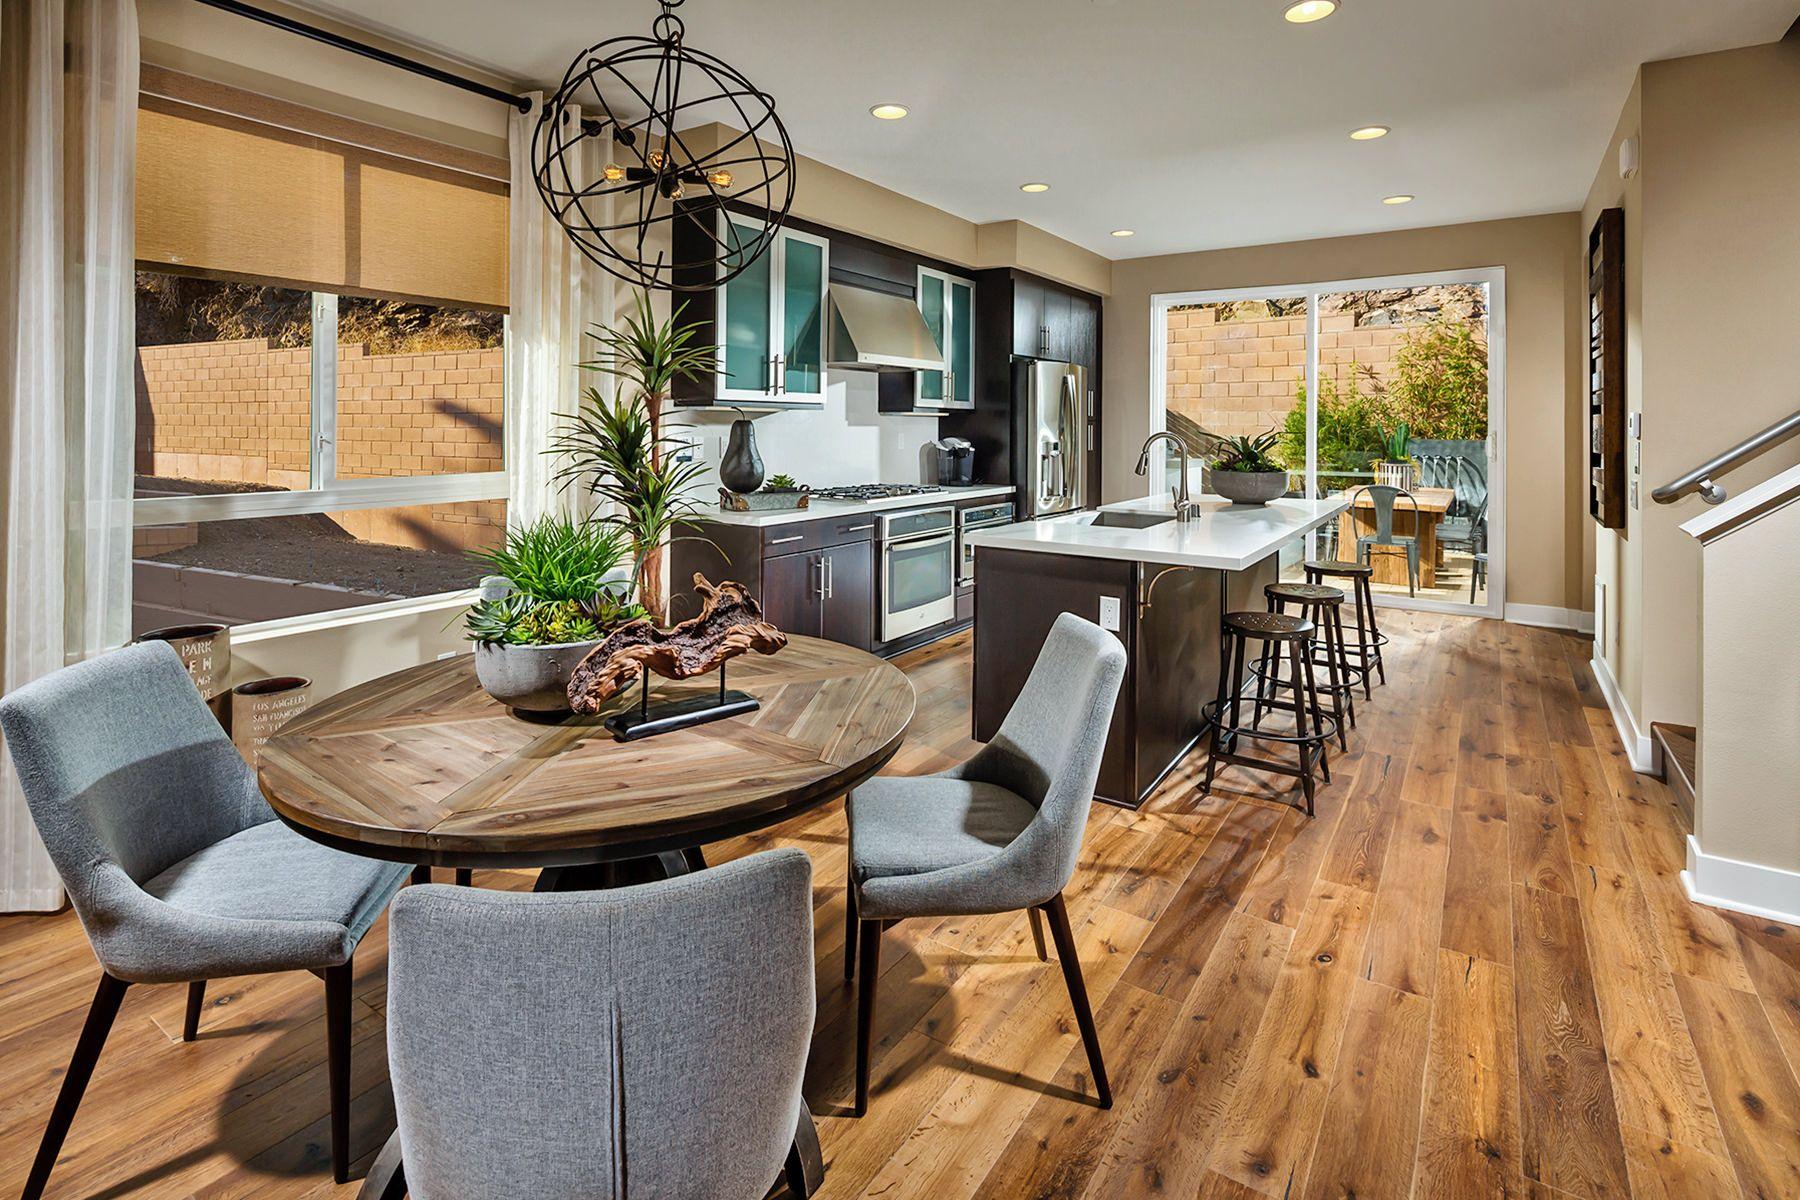 Ambrosia Interior Design Interior Design Stylish Kitchen